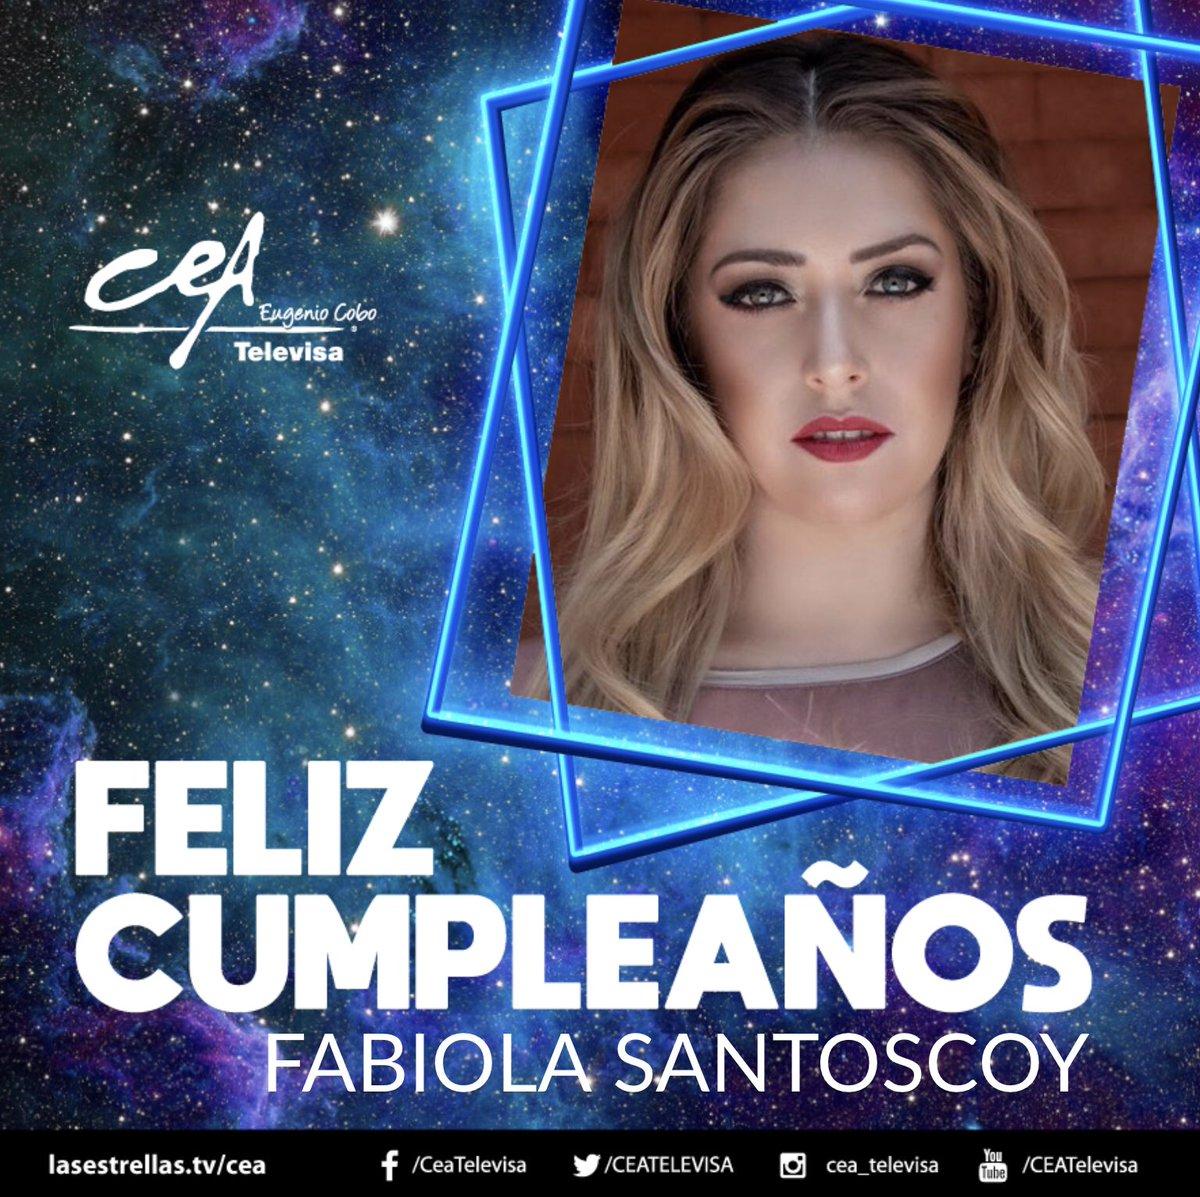 CEA Televisa (@CeaTelevisa) | Twitter